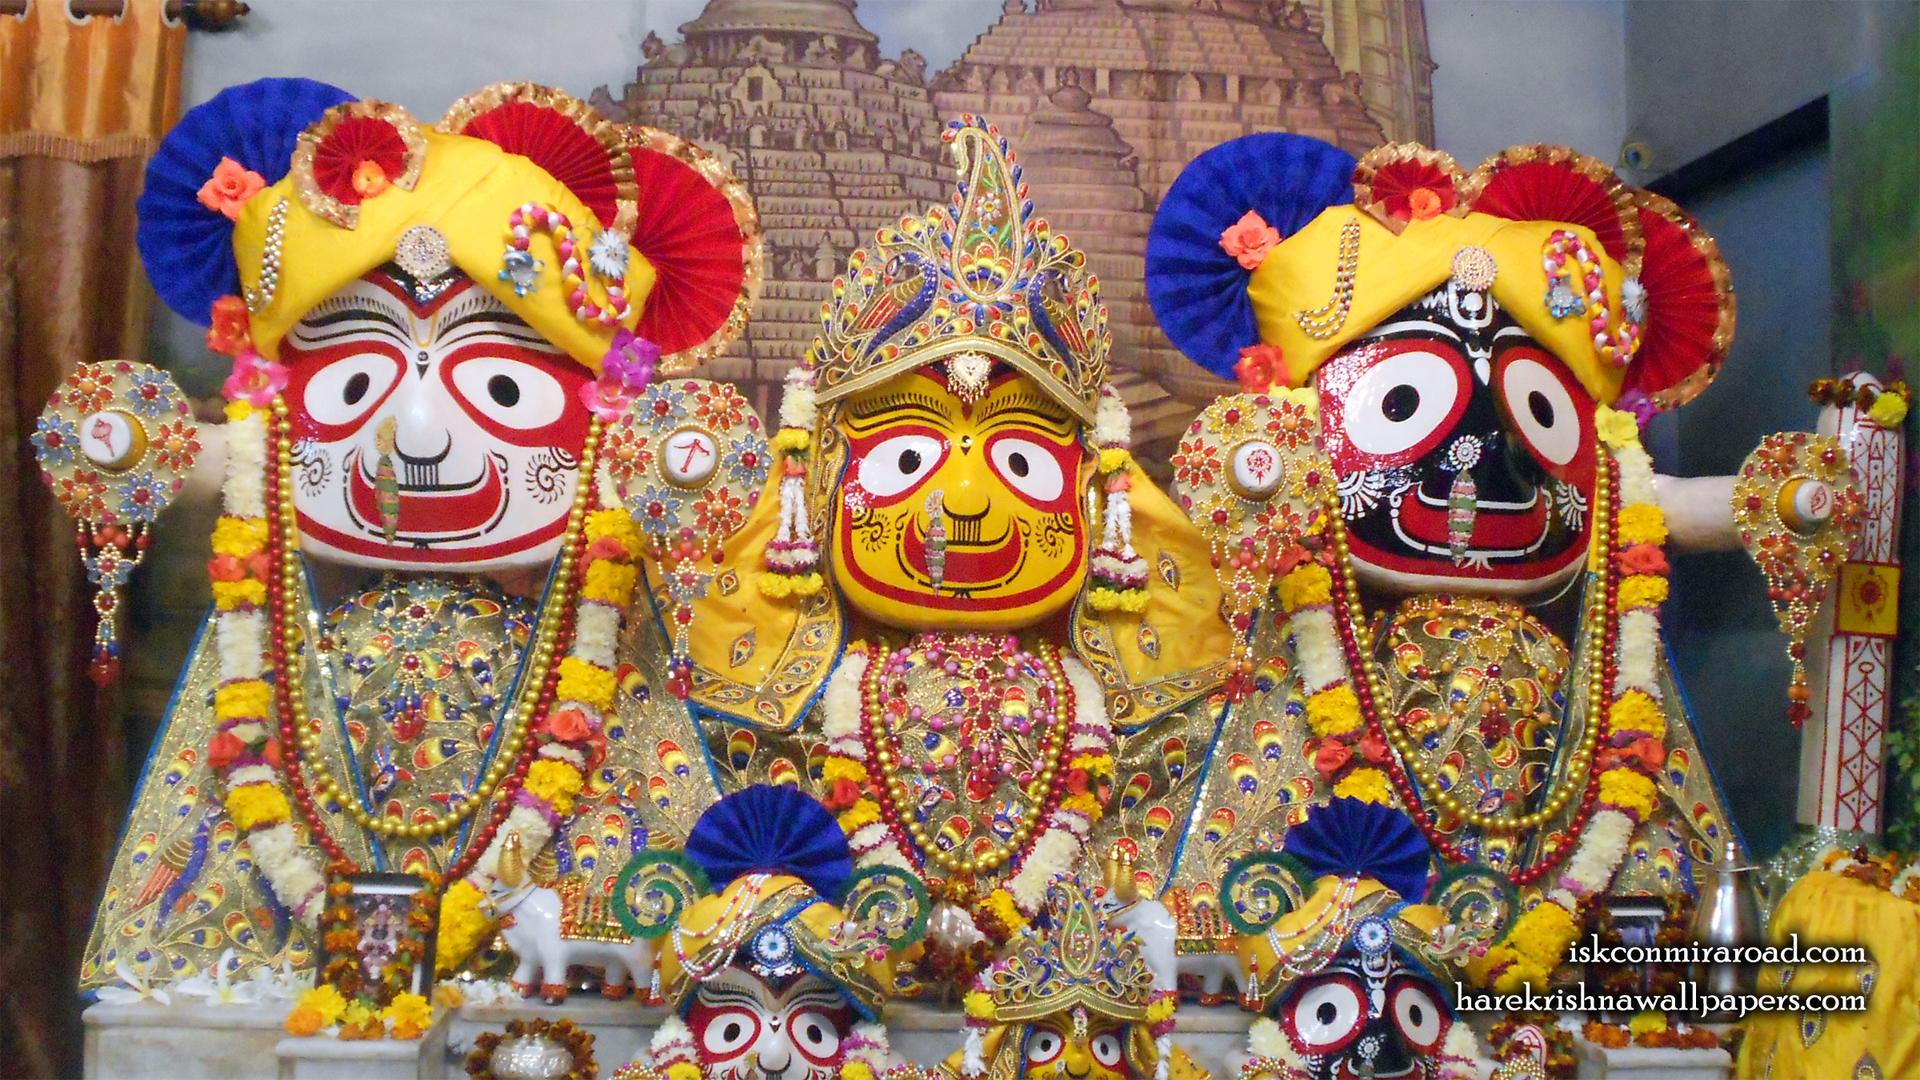 Jagannath Baladeva Subhadra Wallpaper (003) Size 1920x1080 Download